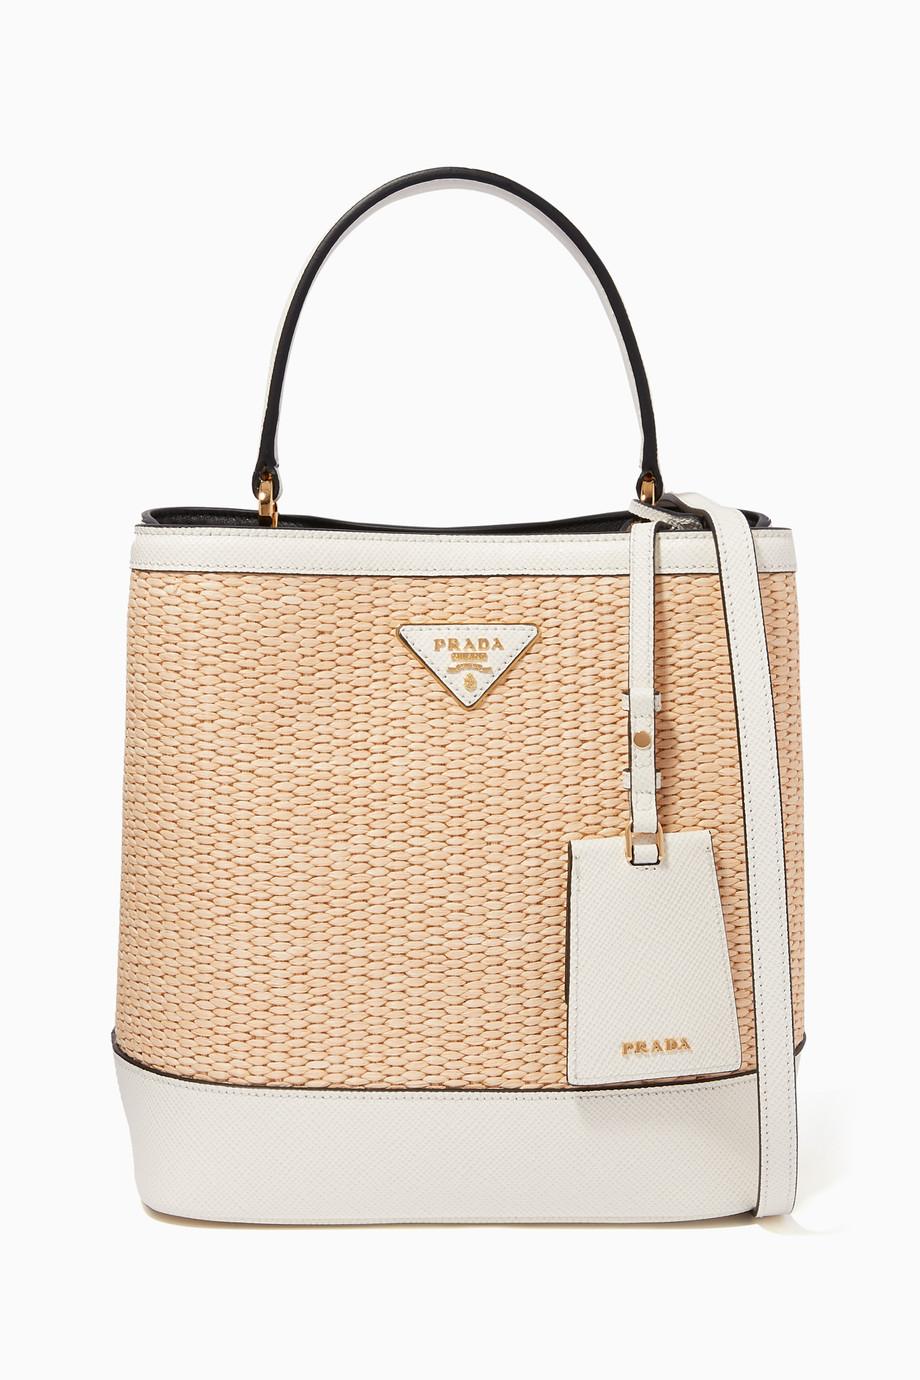 517f4c1eb2edc0 Shop Prada White Medium Straw & Saffiano Leather Bucket Bag for ...